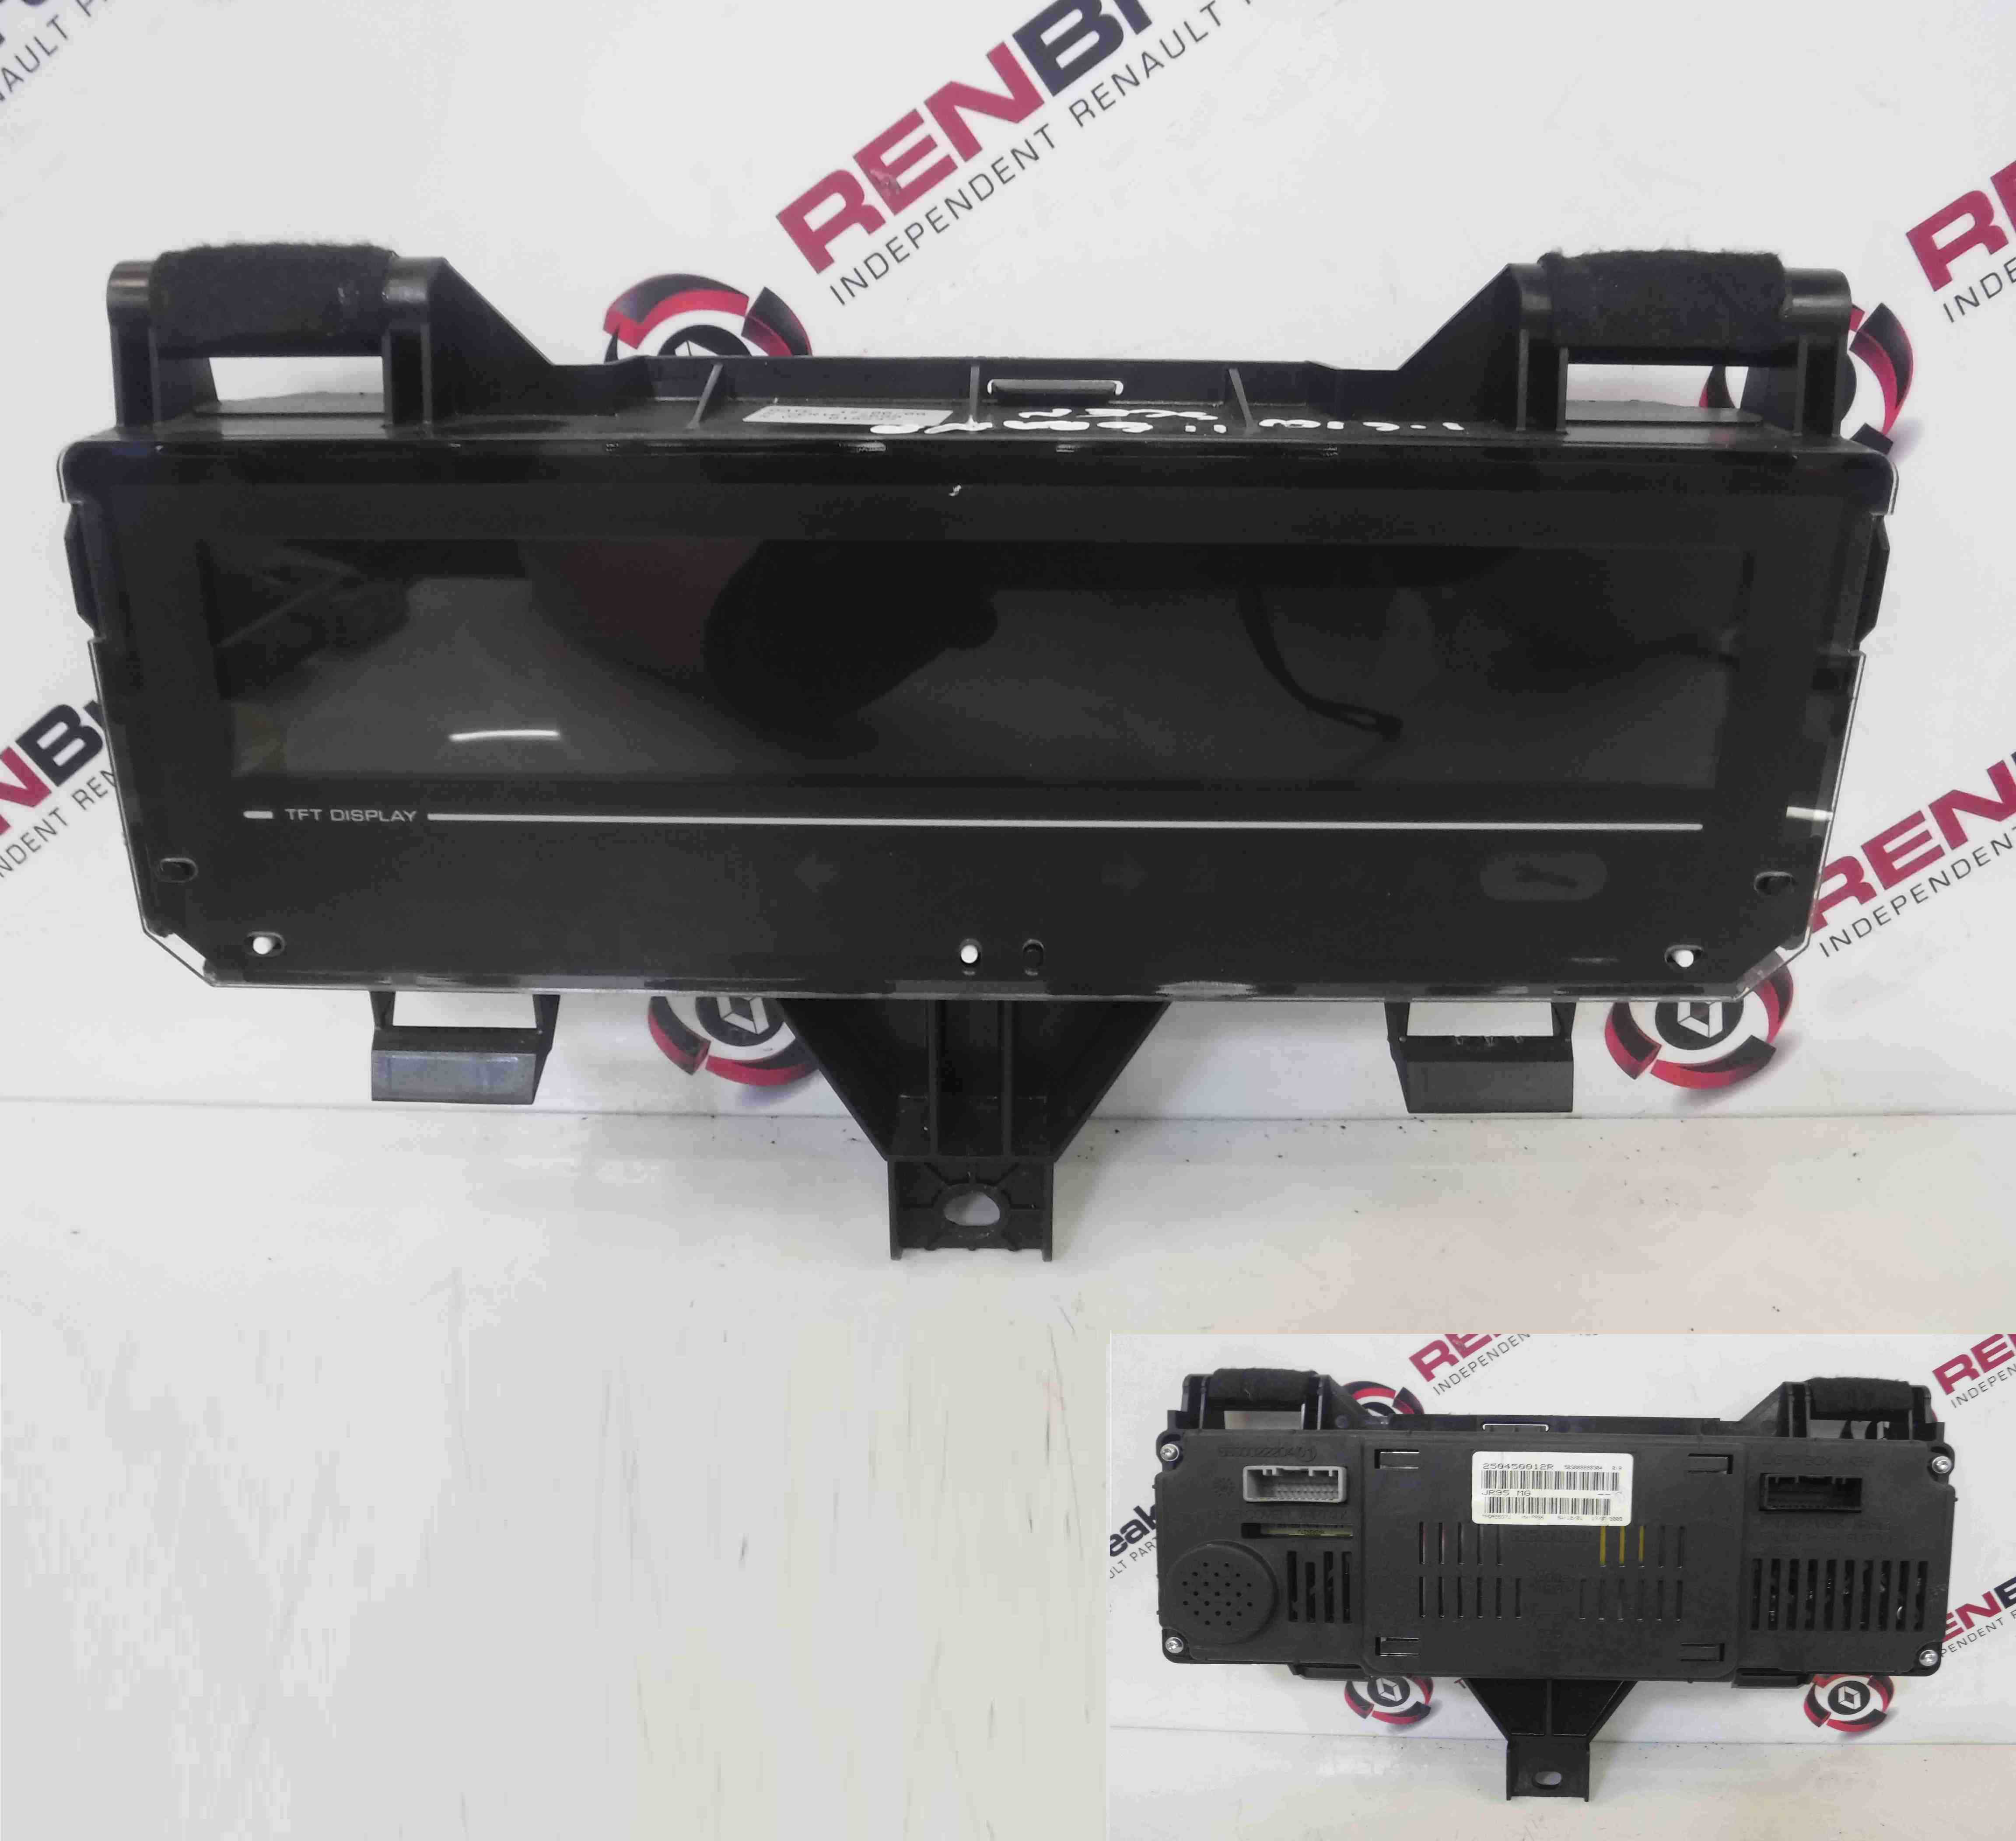 Renault Scenic MK3 2009-2016 Instrument Panel Dials Clocks Speedo